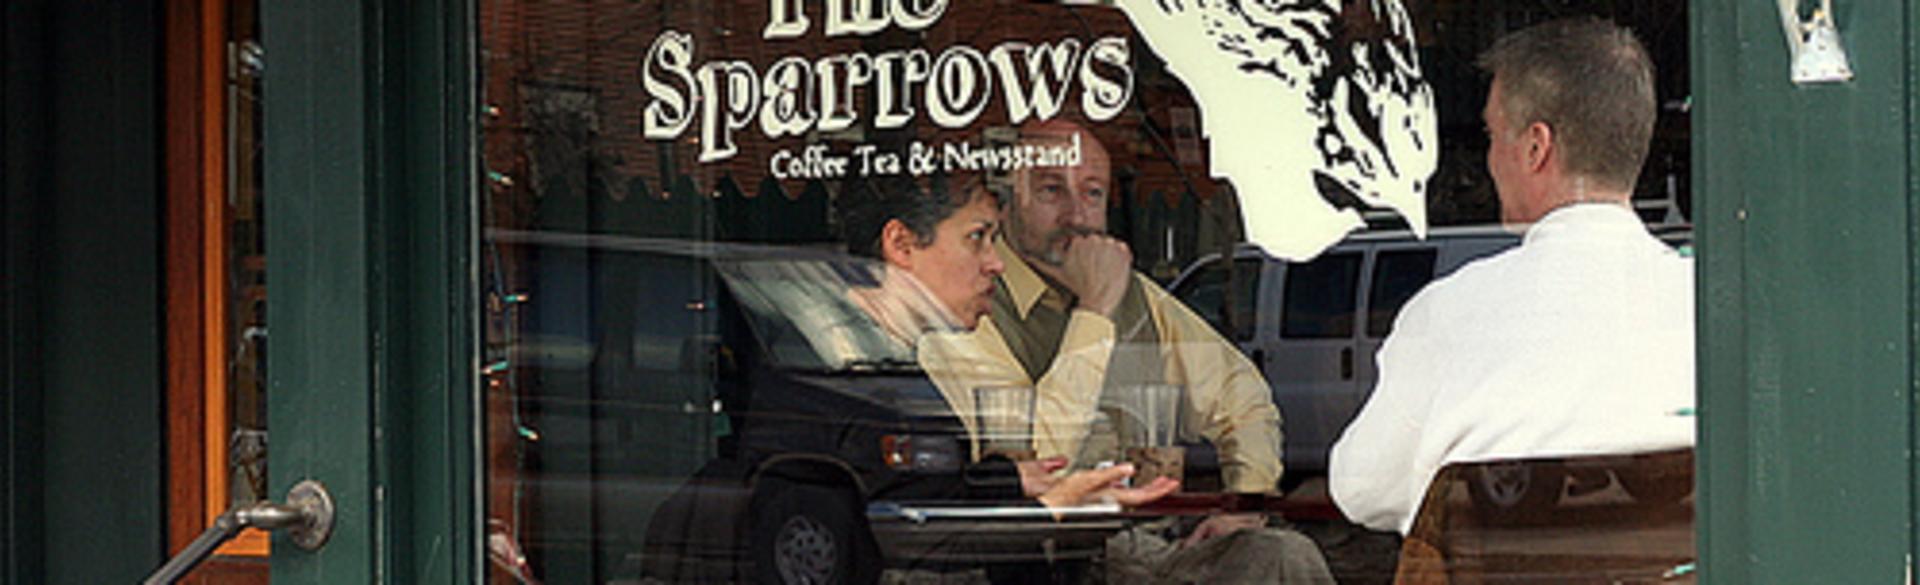 The Sparrows Coffee Shop